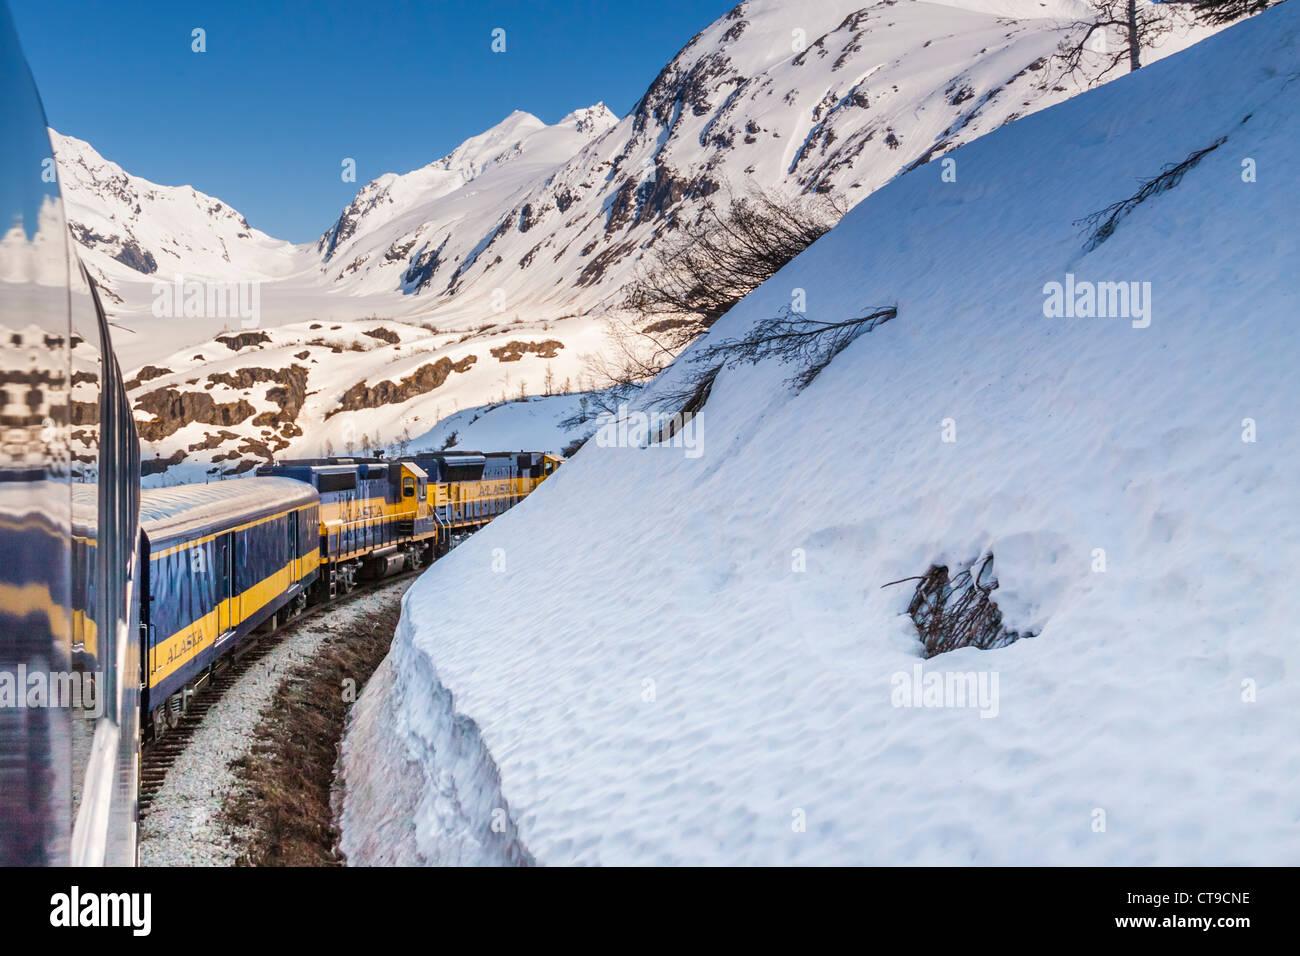 Alaska Railroad Coastal Classic Train Ride Between Seward And Anchorage Alaska Stock Photo Alamy